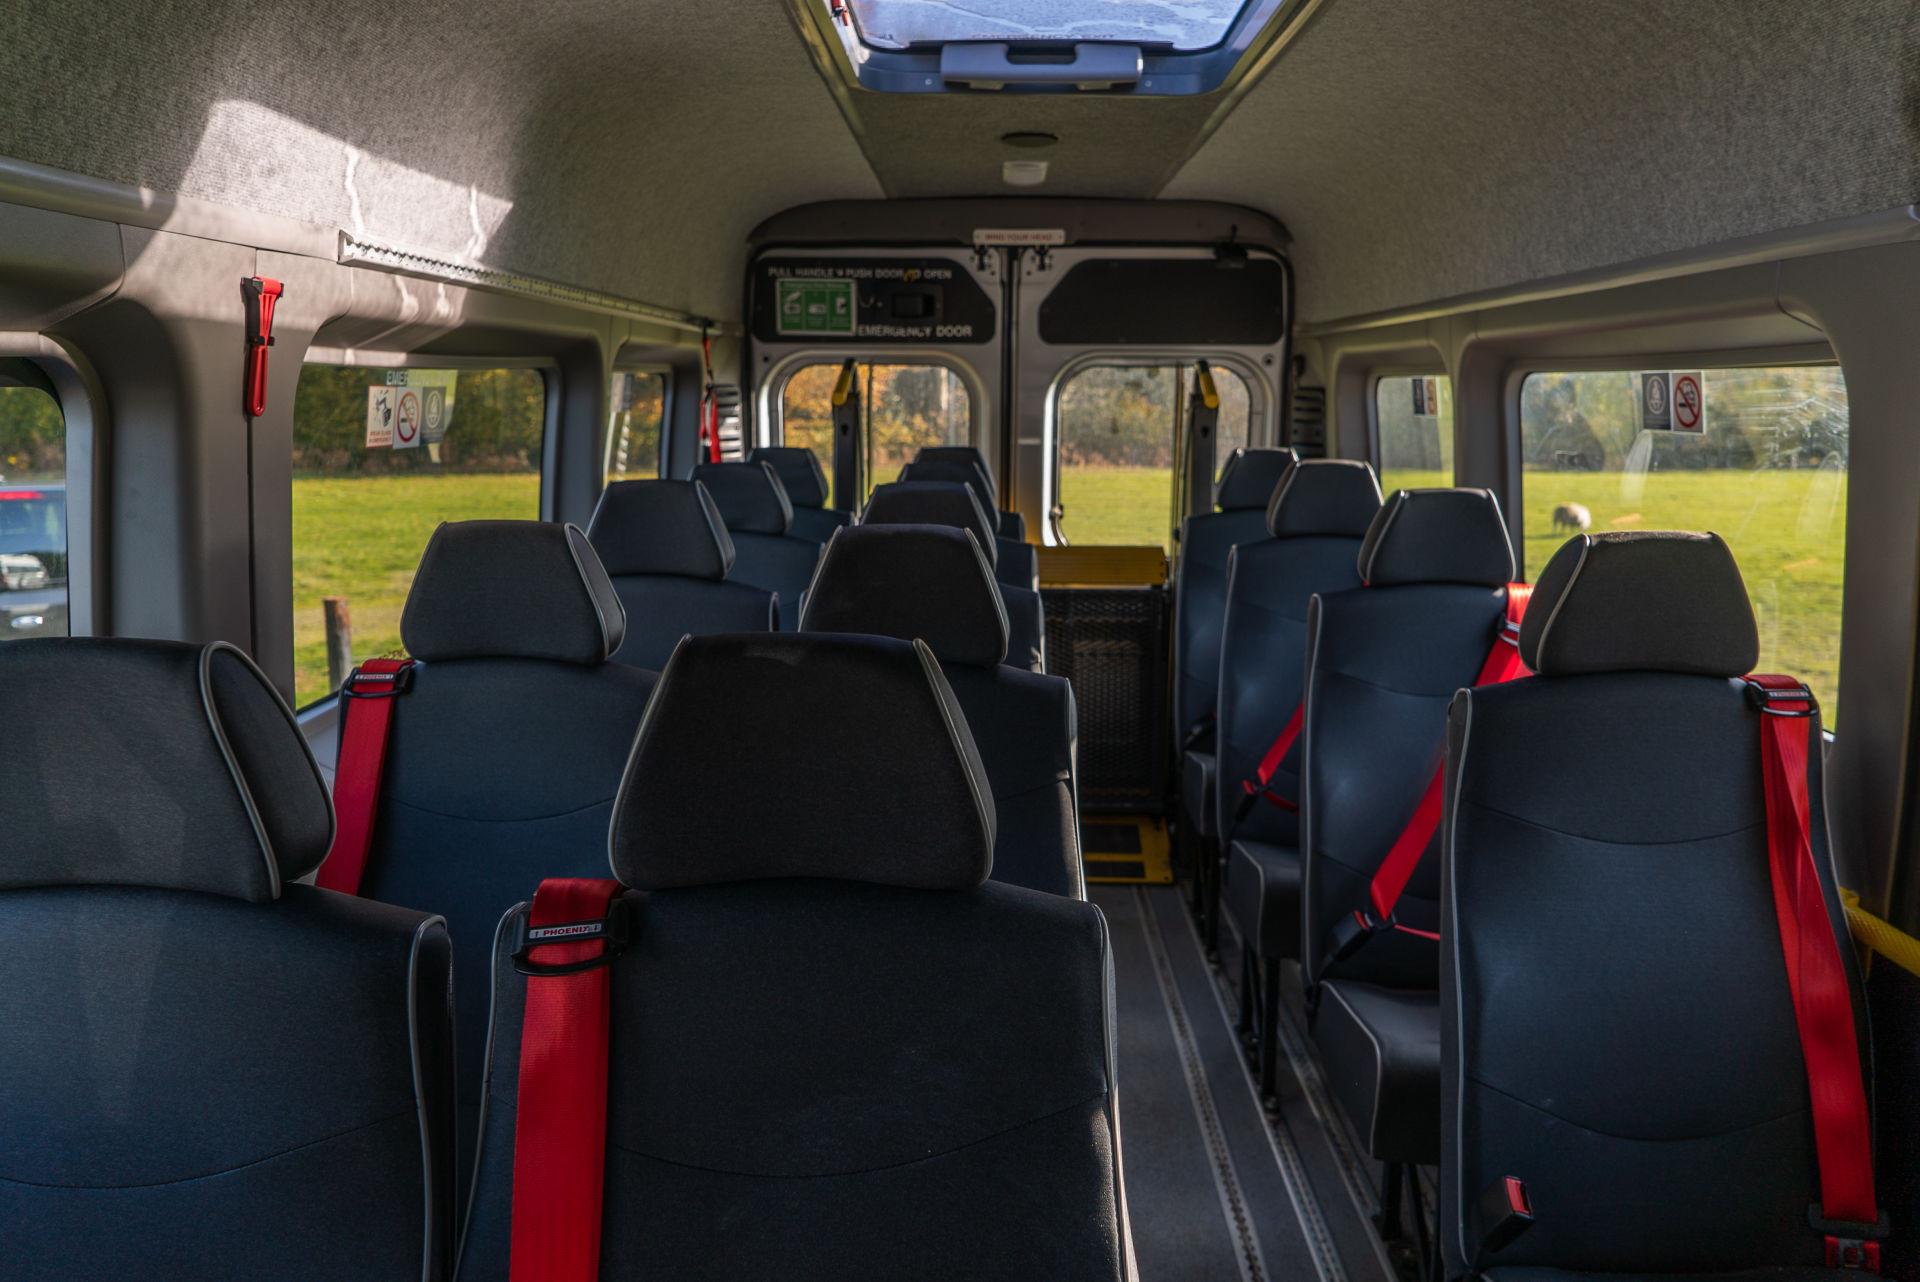 Peugeot Boxer 17 Seater Accessible Minibus for Sale - Image 2